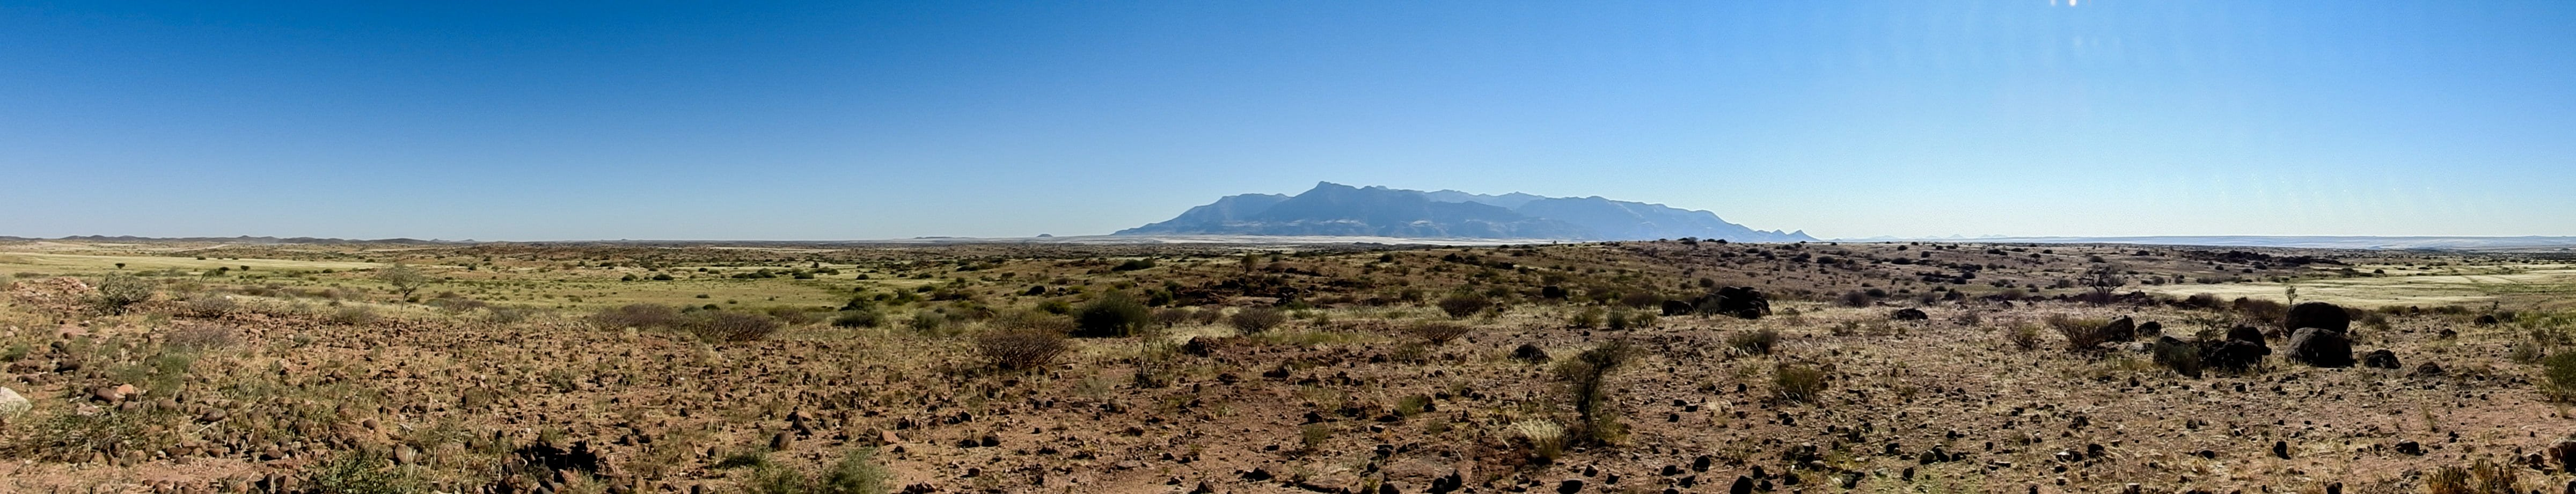 Namibia-Brandberg-02